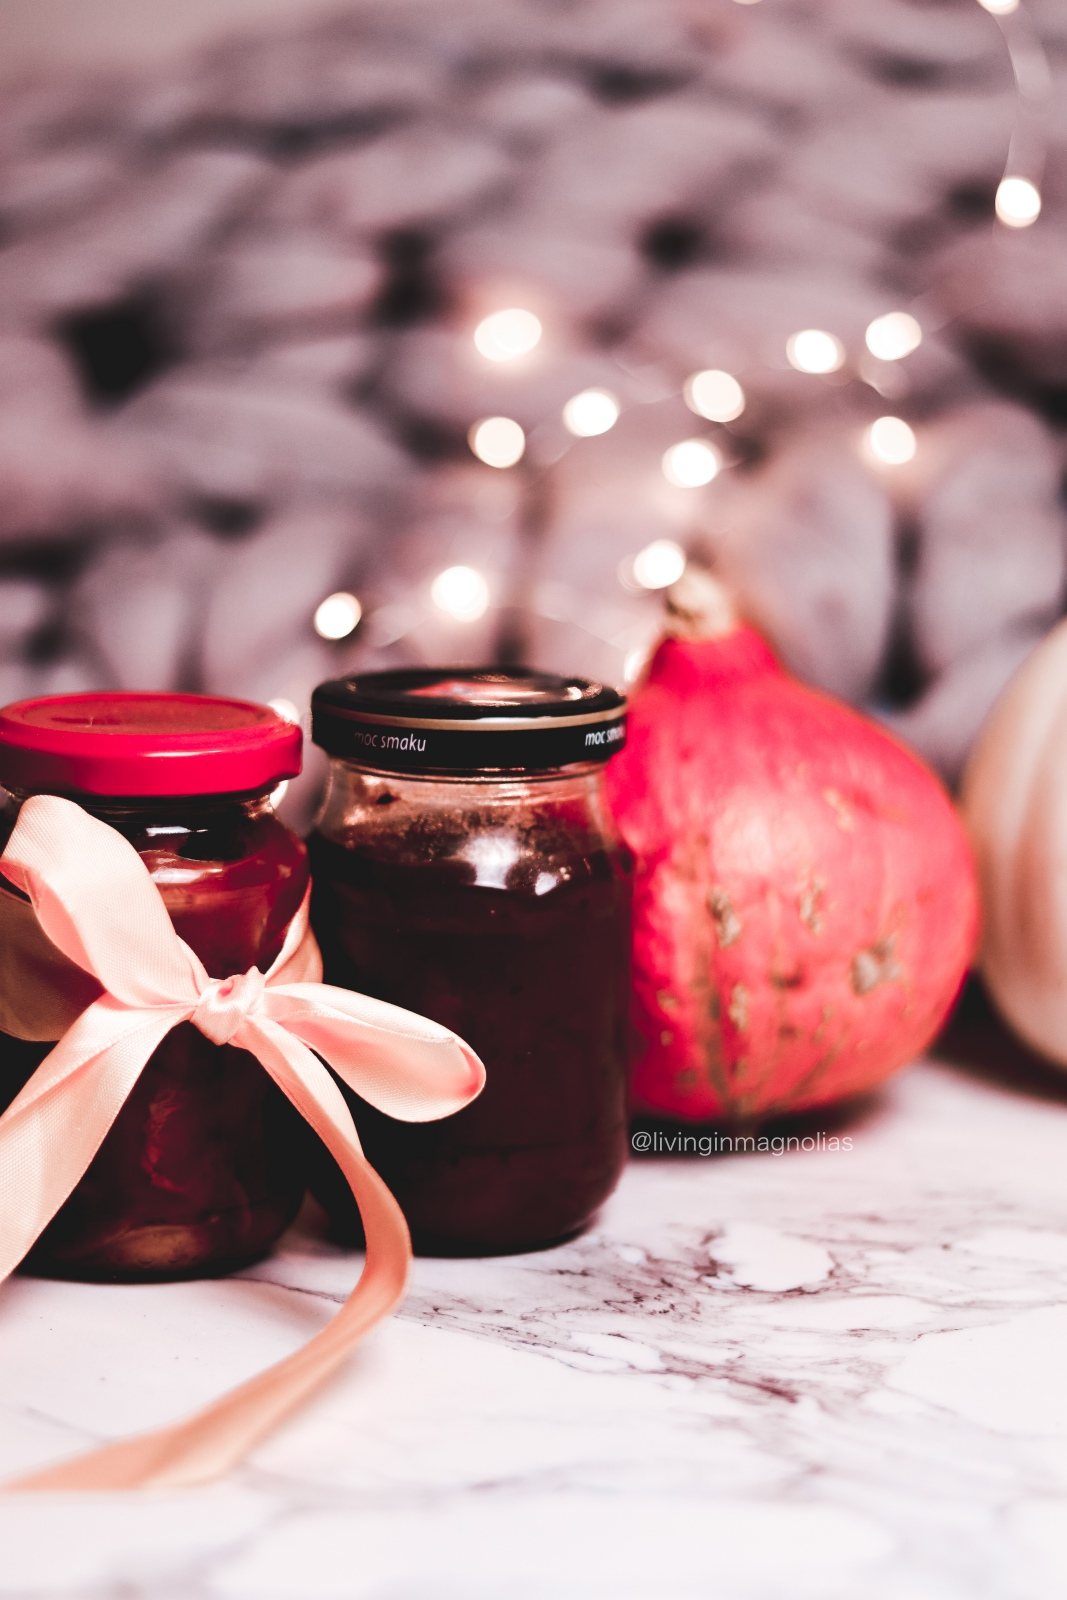 Autumn vibe how to save money jesien jak oszczedzac jesienna kuchnia autumn food